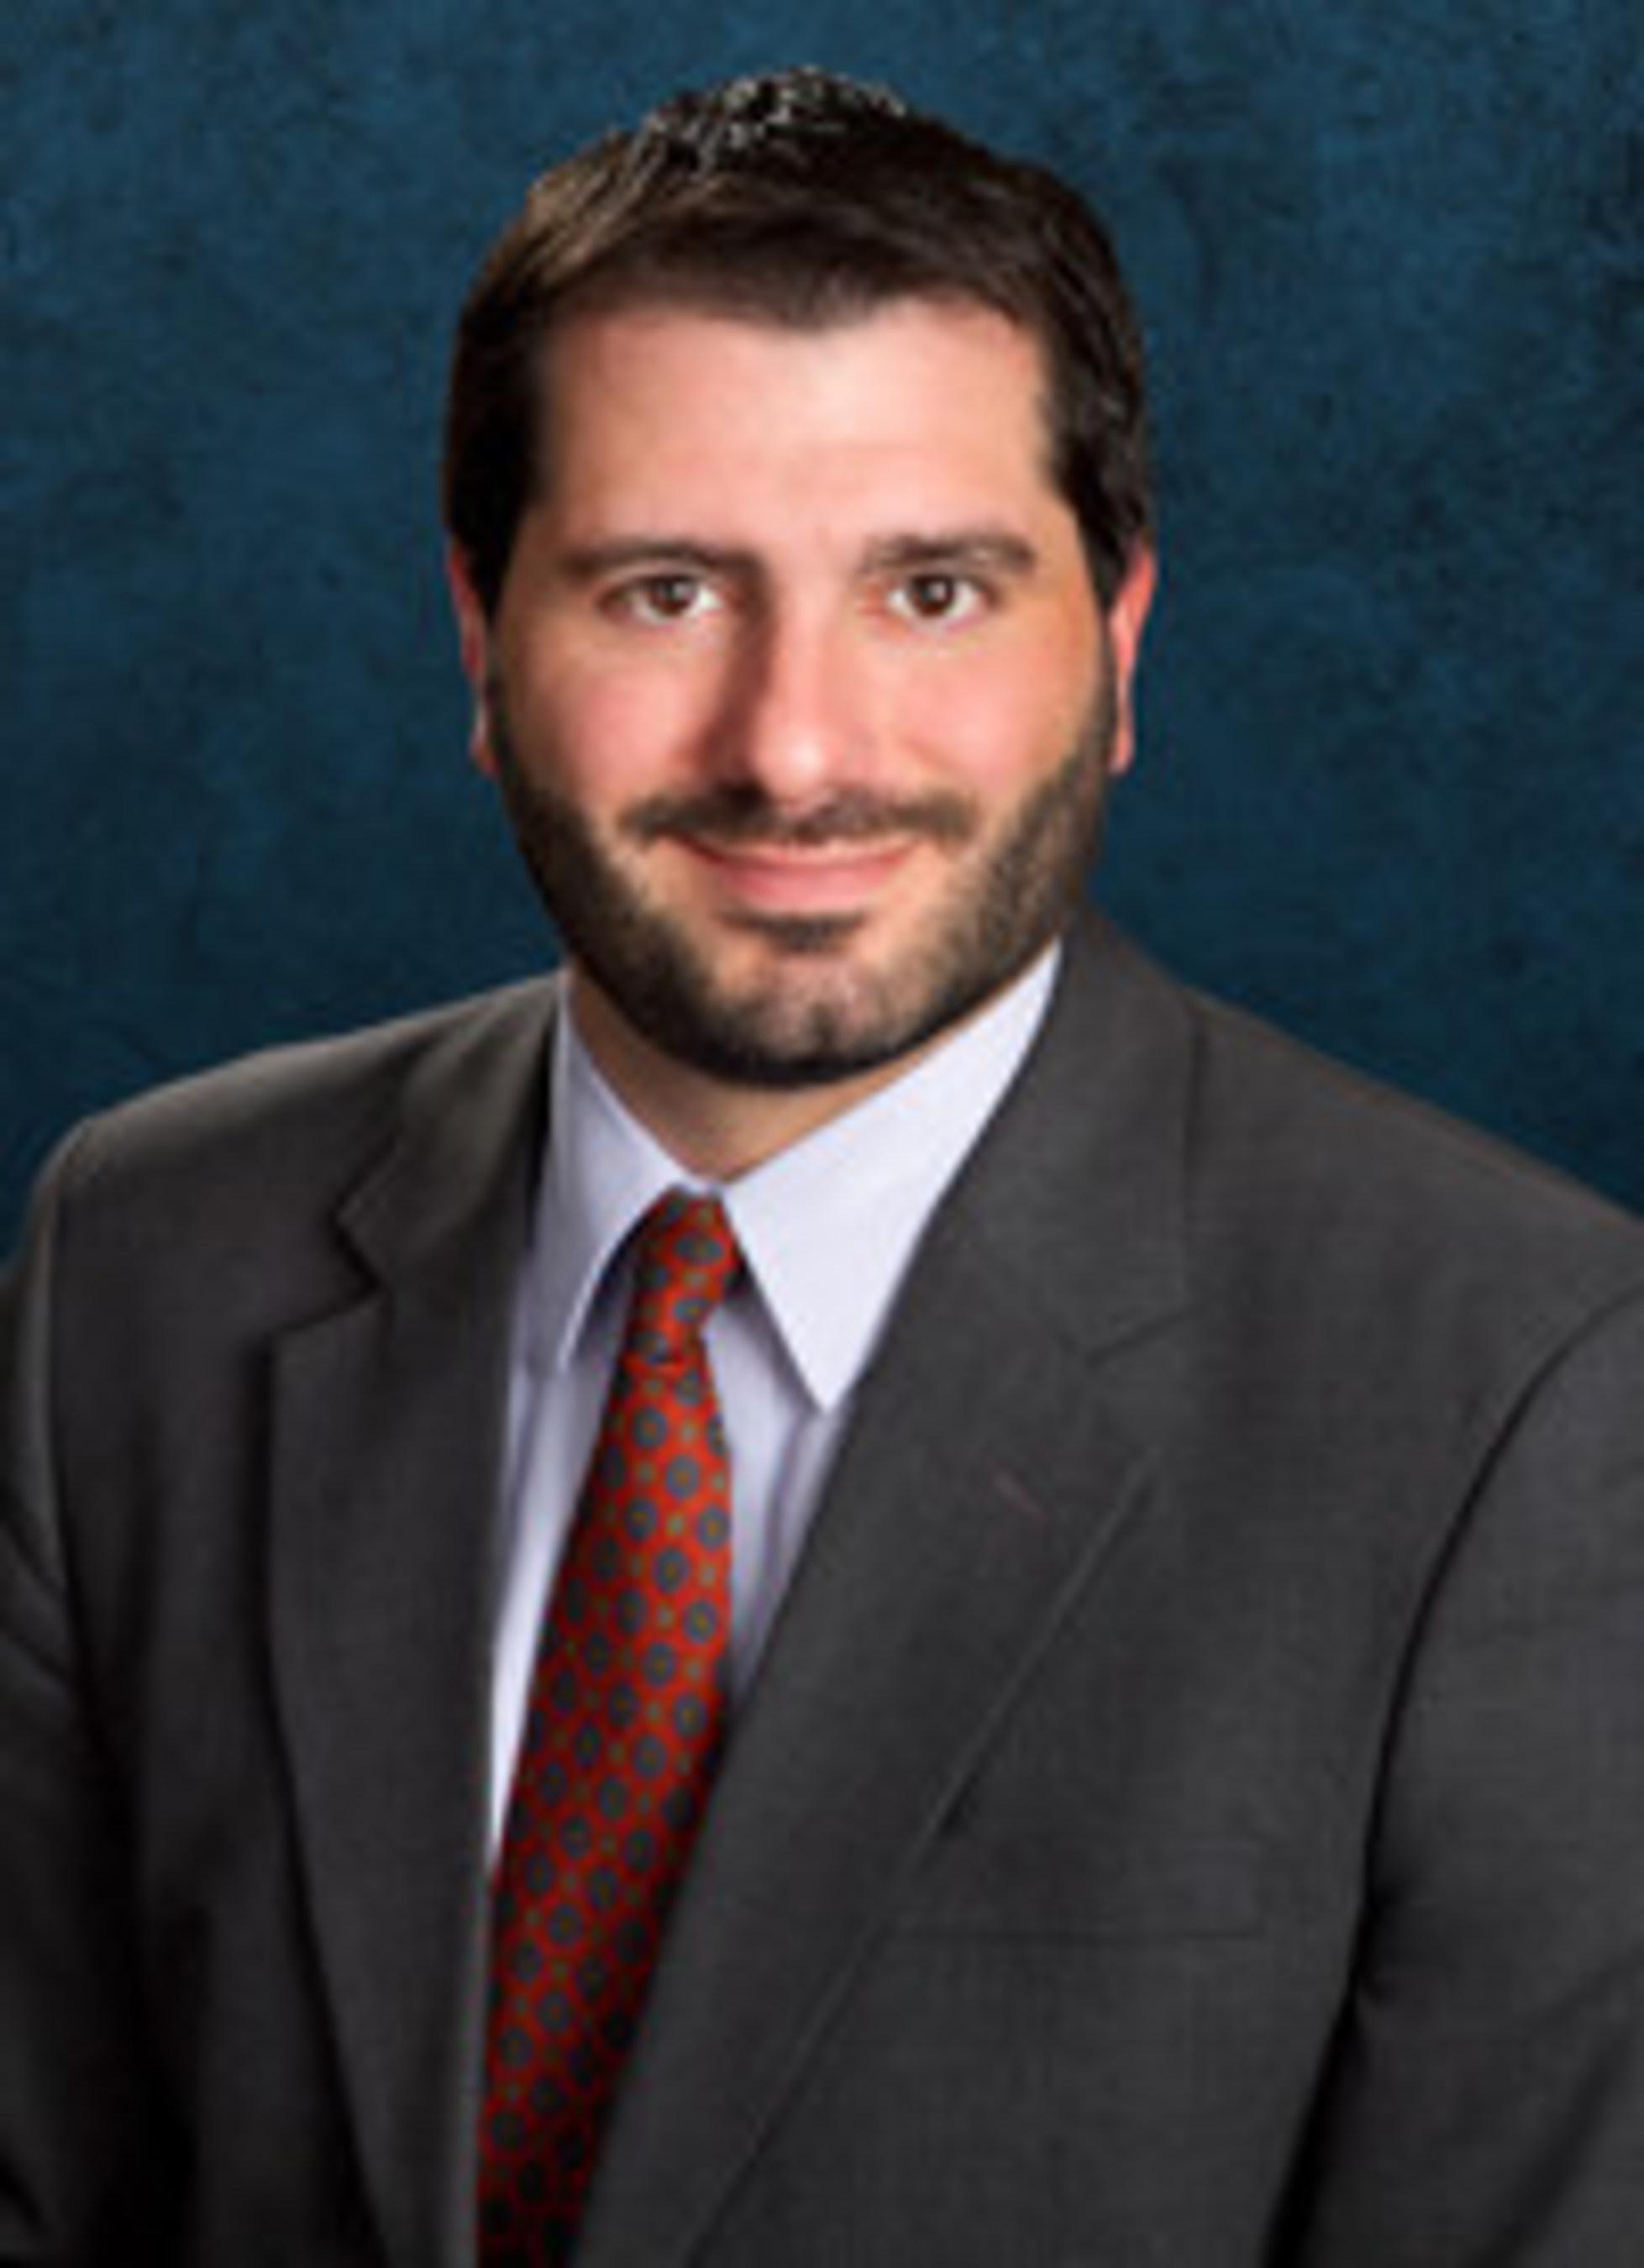 Attorney Jay Tiftickjian